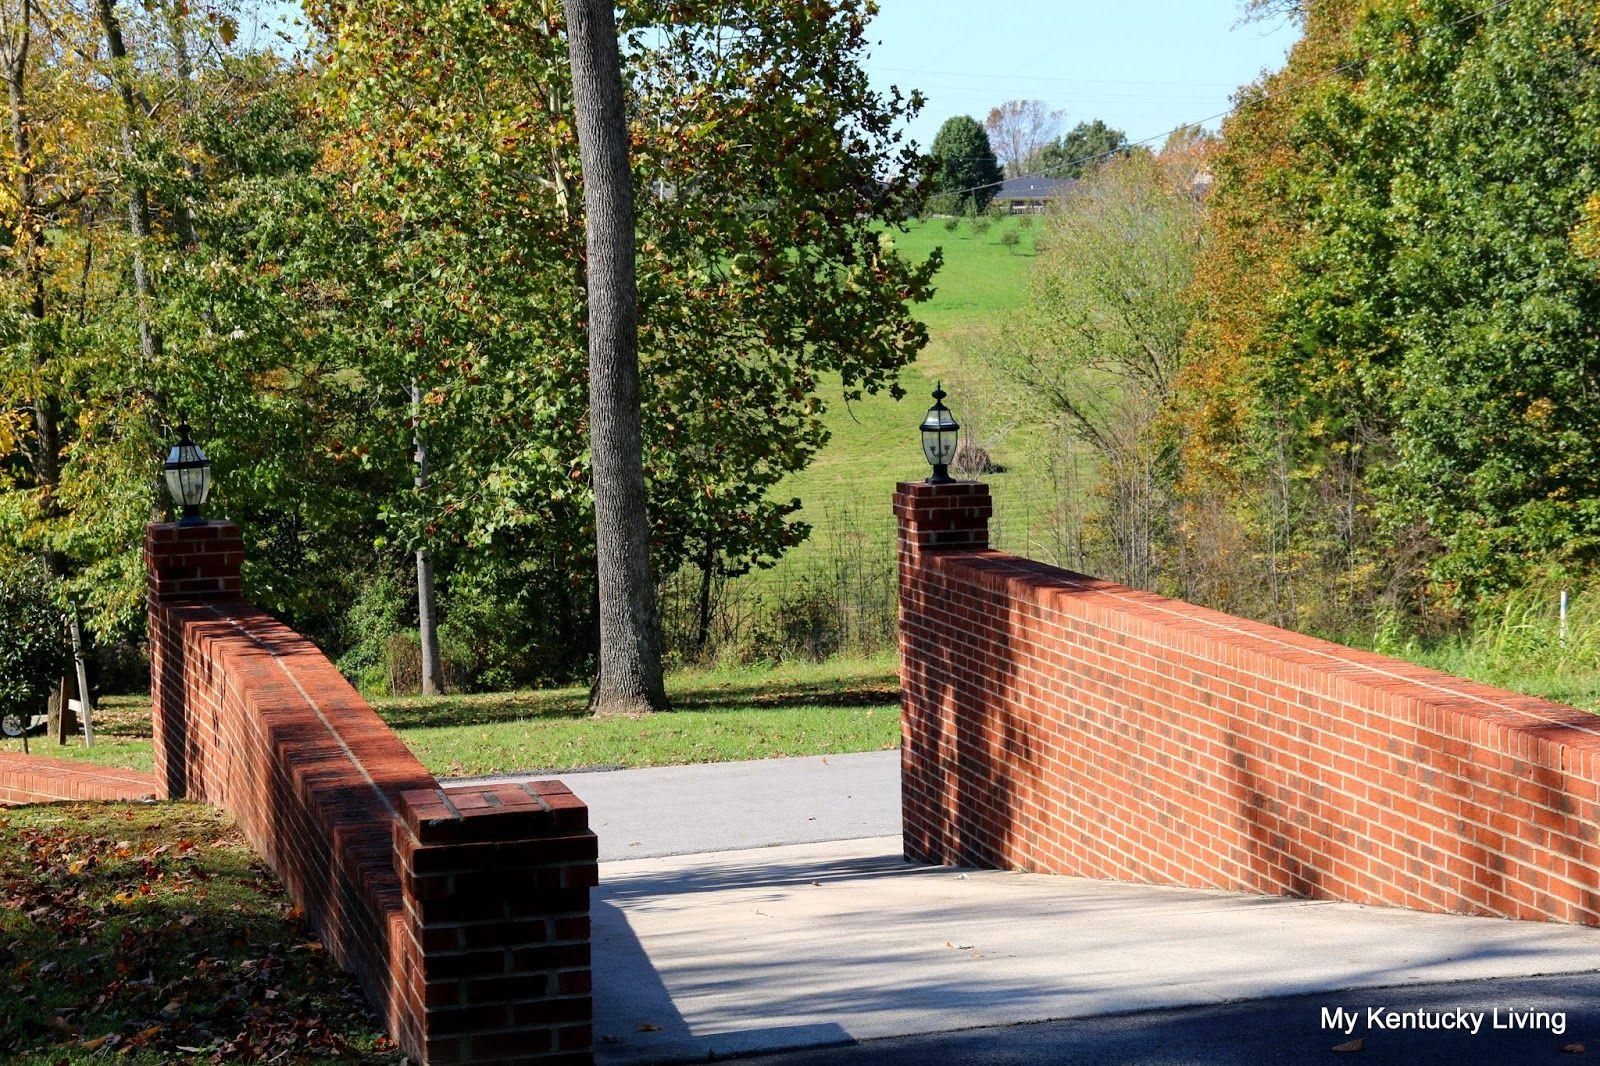 My Kentucky Living My Kentucky Life: Taking a walk with Designer Dog